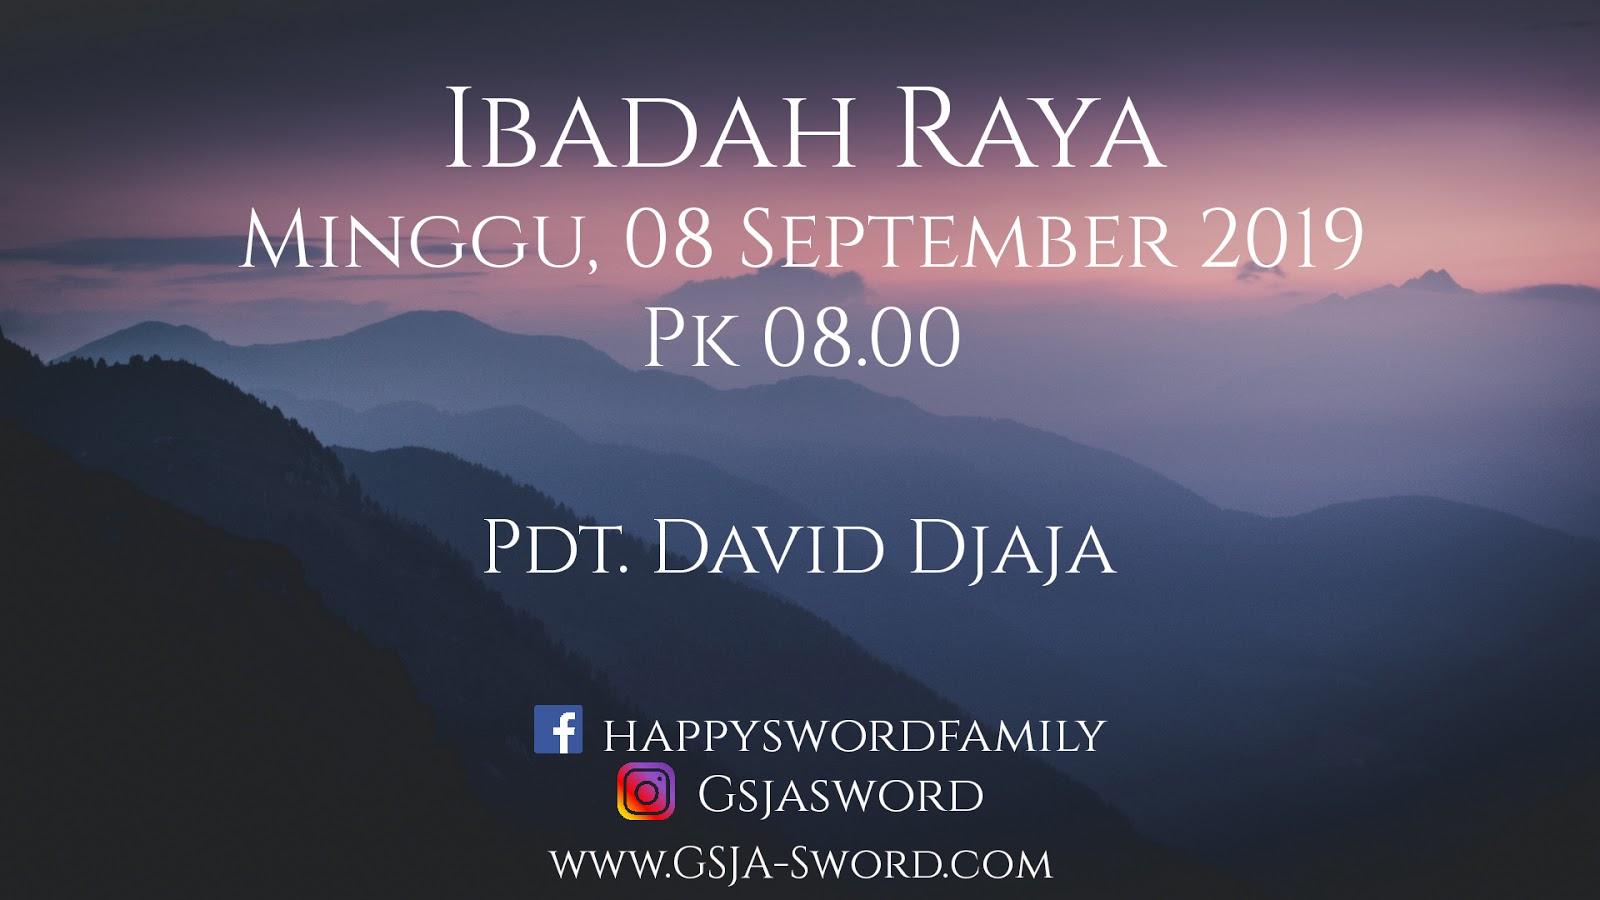 Ibadah Raya GSJA Sword 8 September 2019 Firman: Pdt. David Djaja